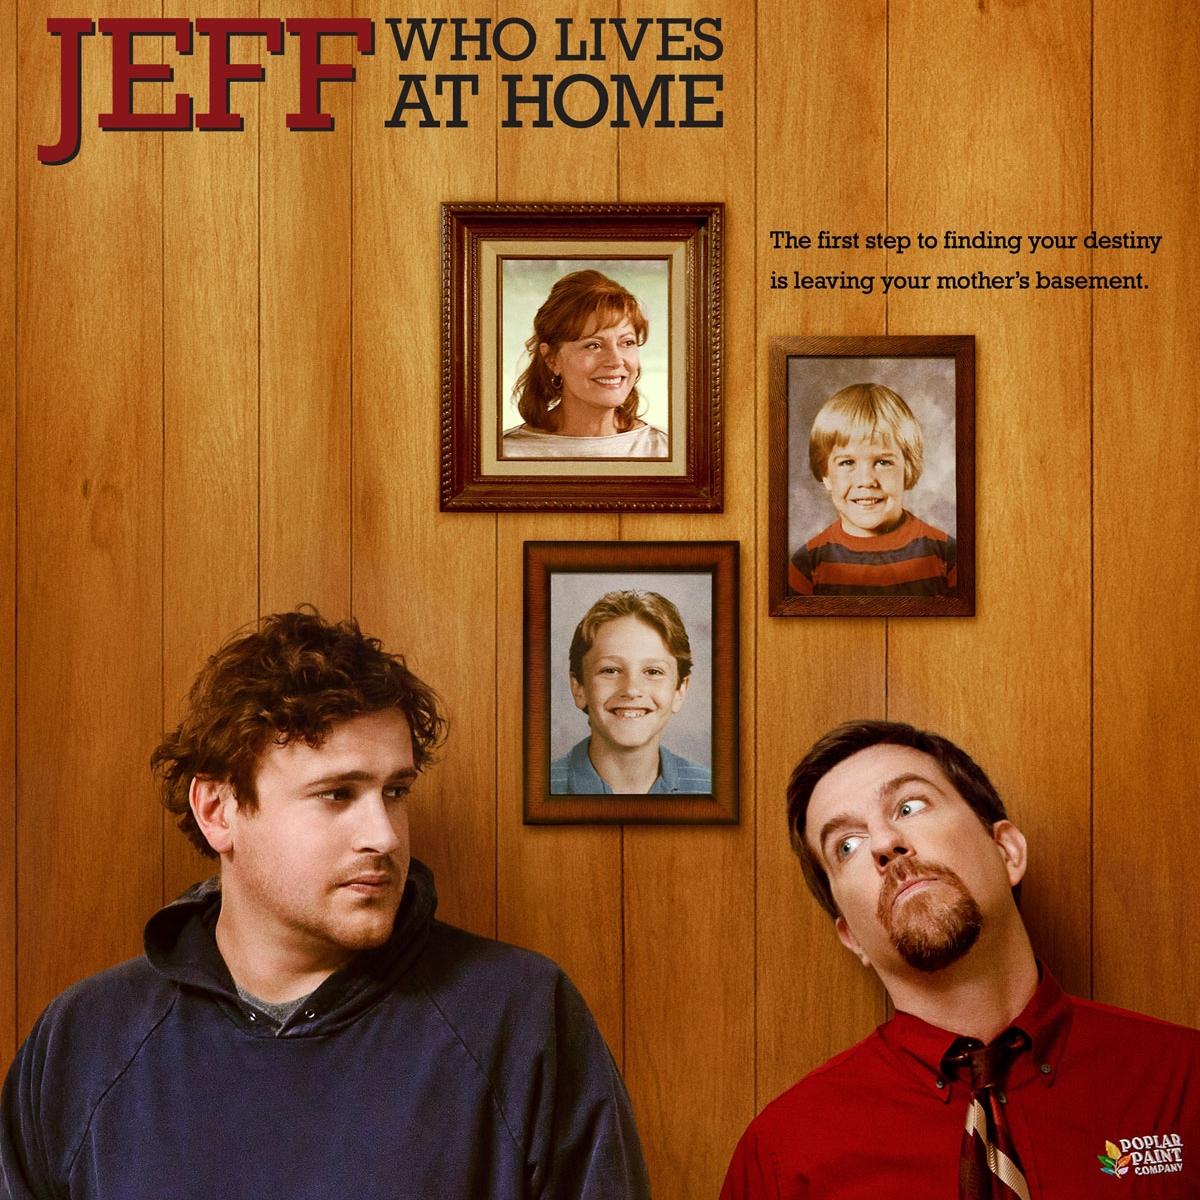 Jeff, Who Lives At Home - Score Rec, Mix